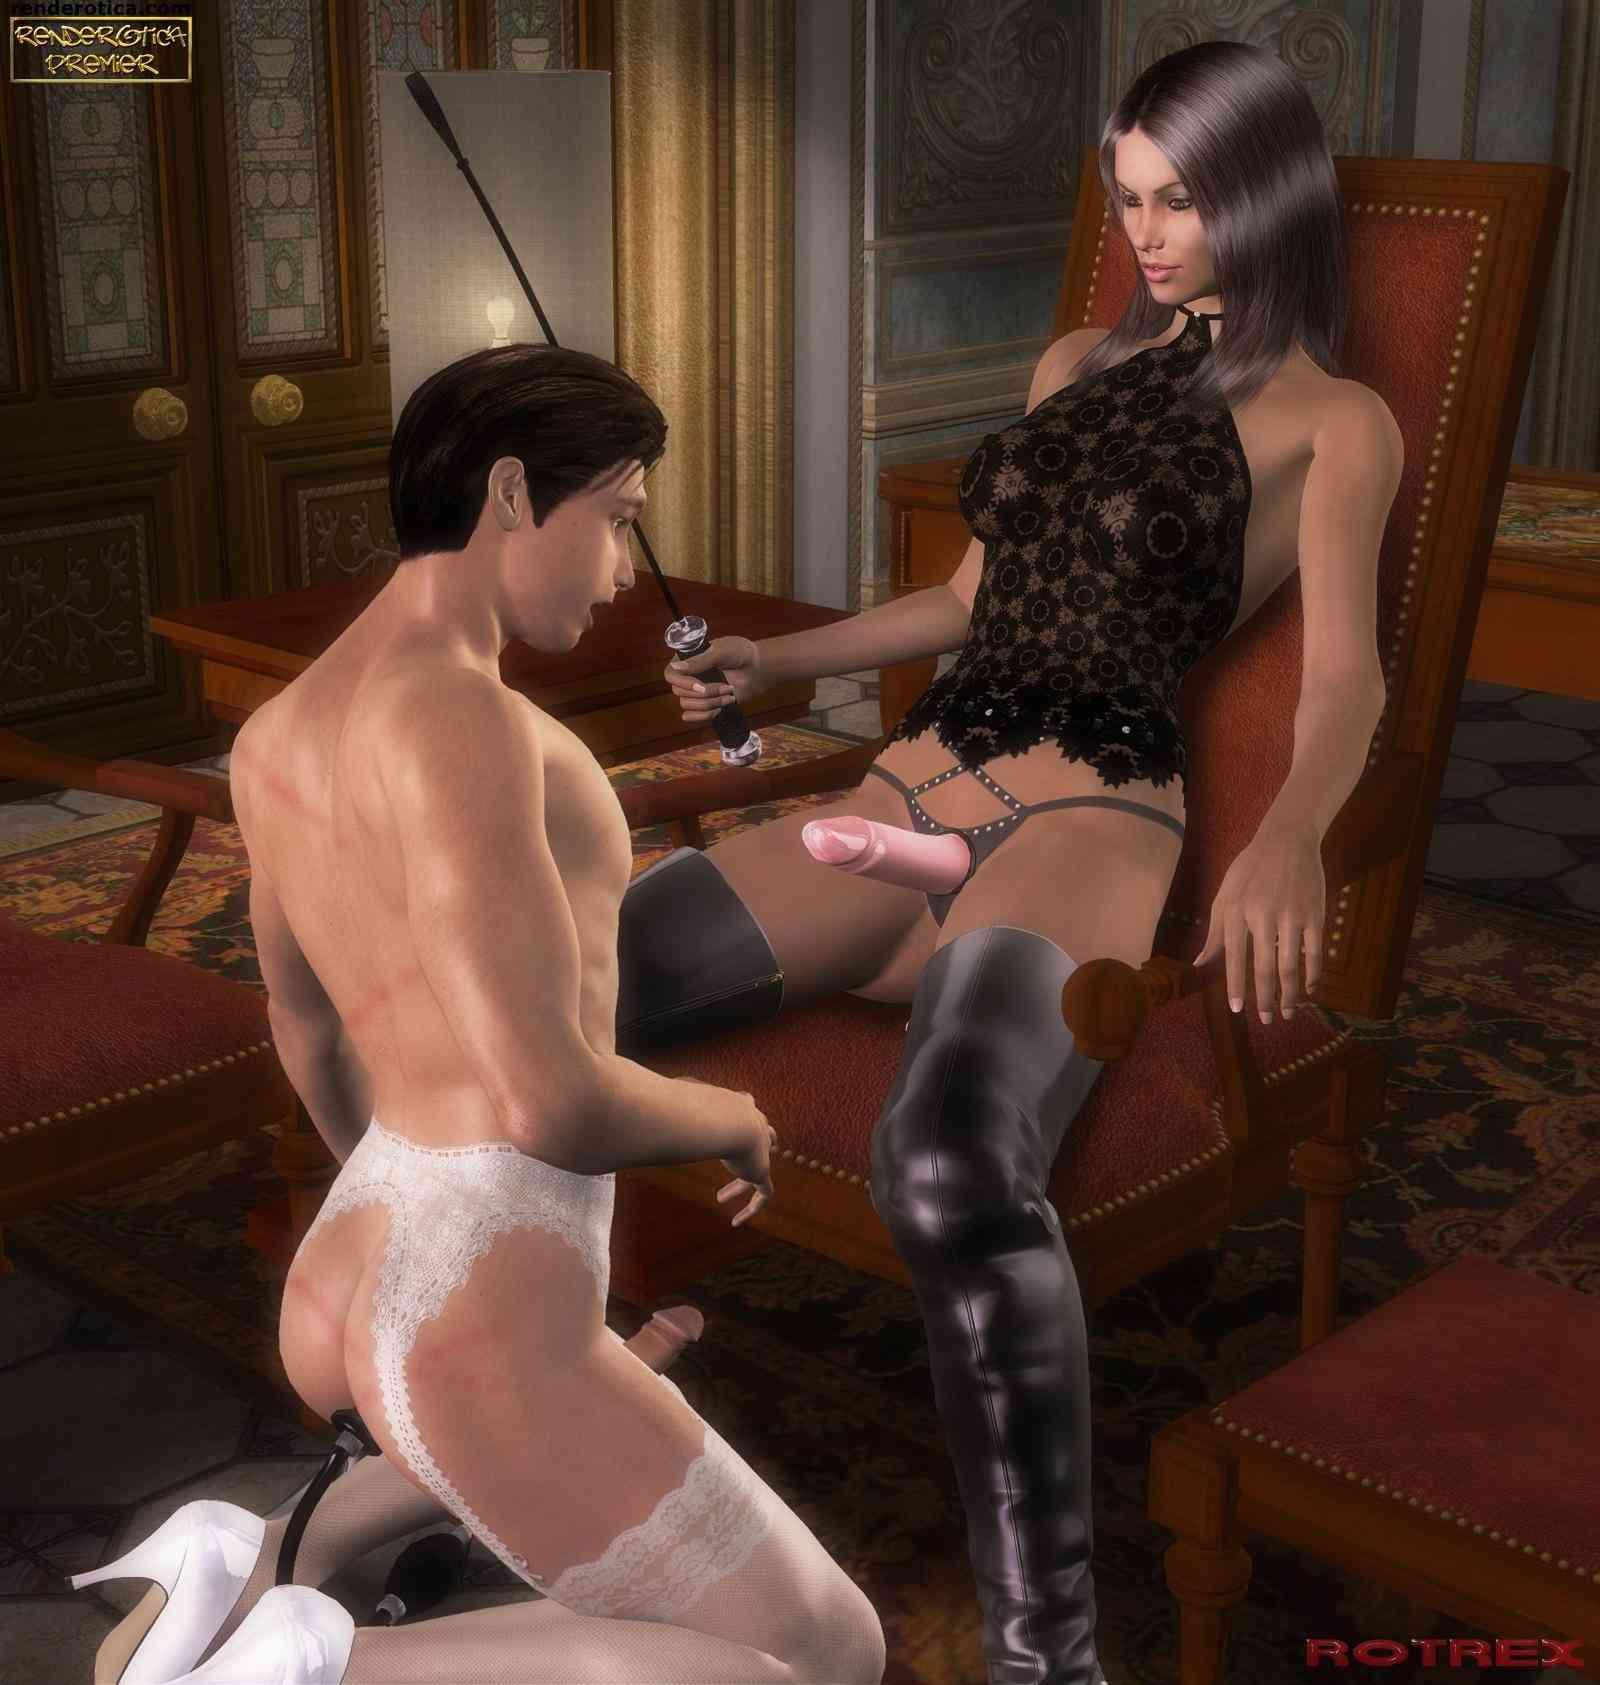 Female domination sissy husband